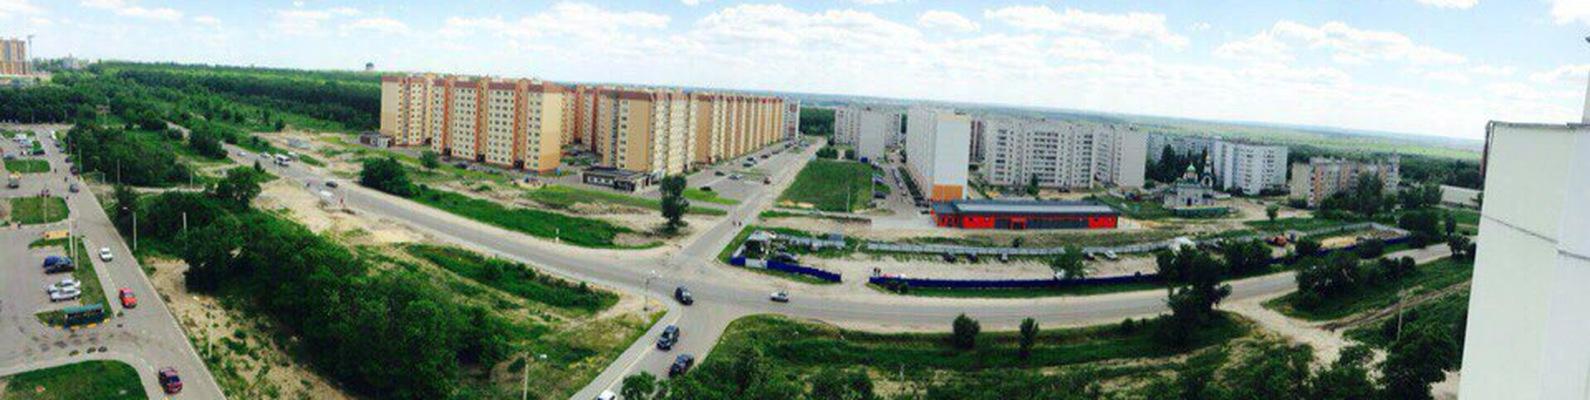 Агентство недвижимости Сити Центр Квартиры в Воронеже на